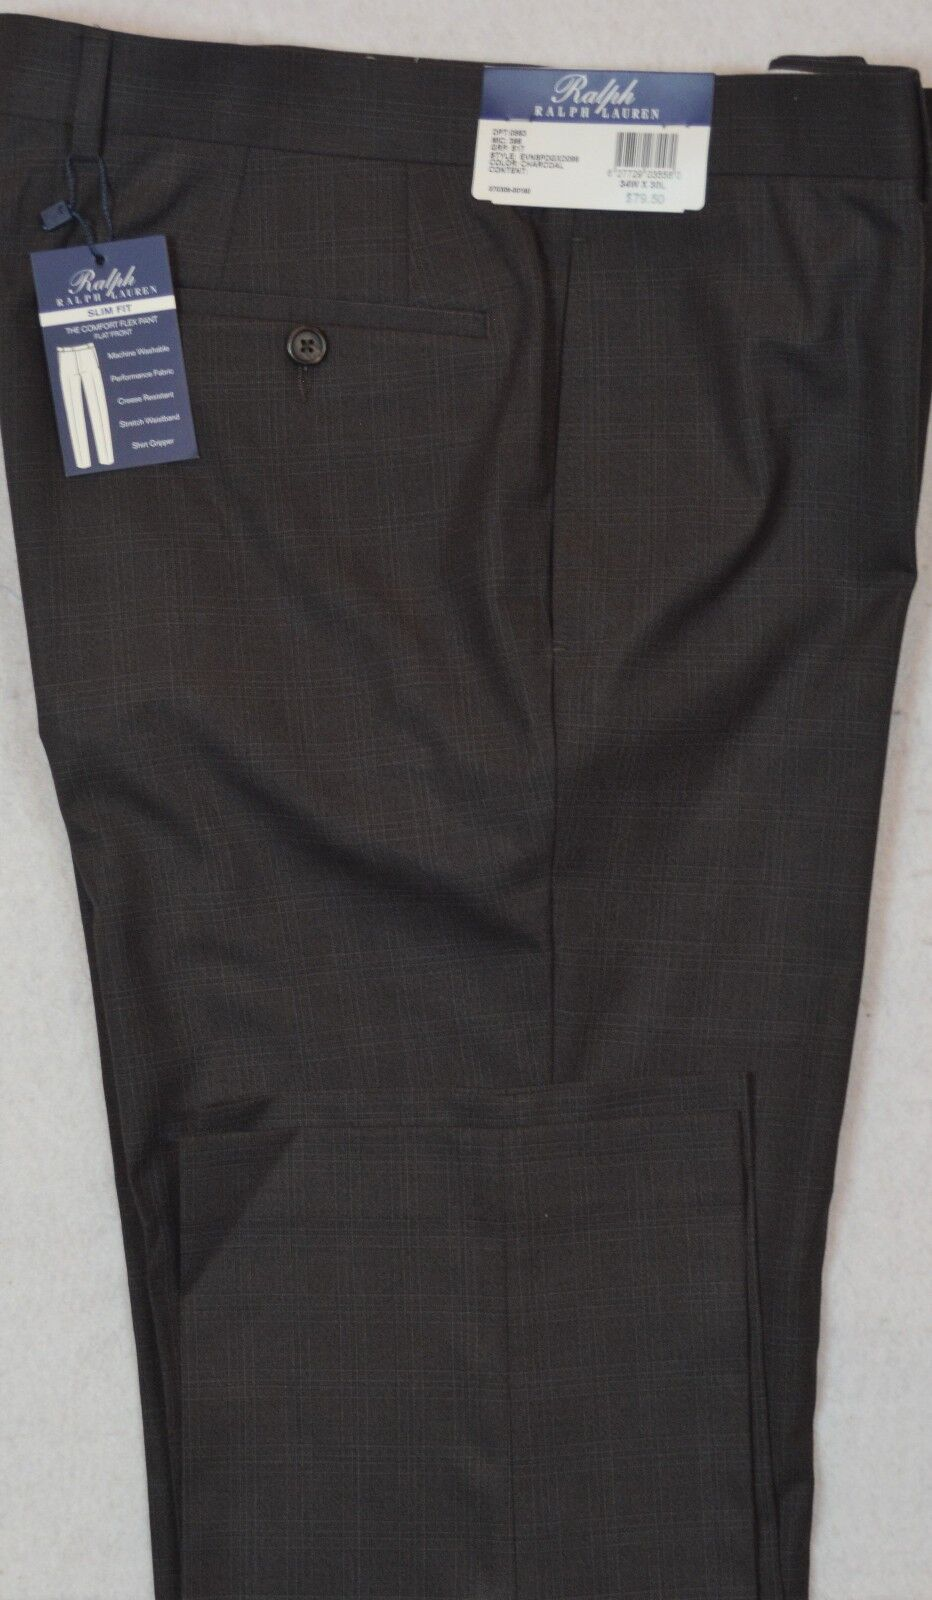 Ralph Lauren Comfort Flex Slim Fit Charcoal Flat Front Dress Pant 40 32 NWT